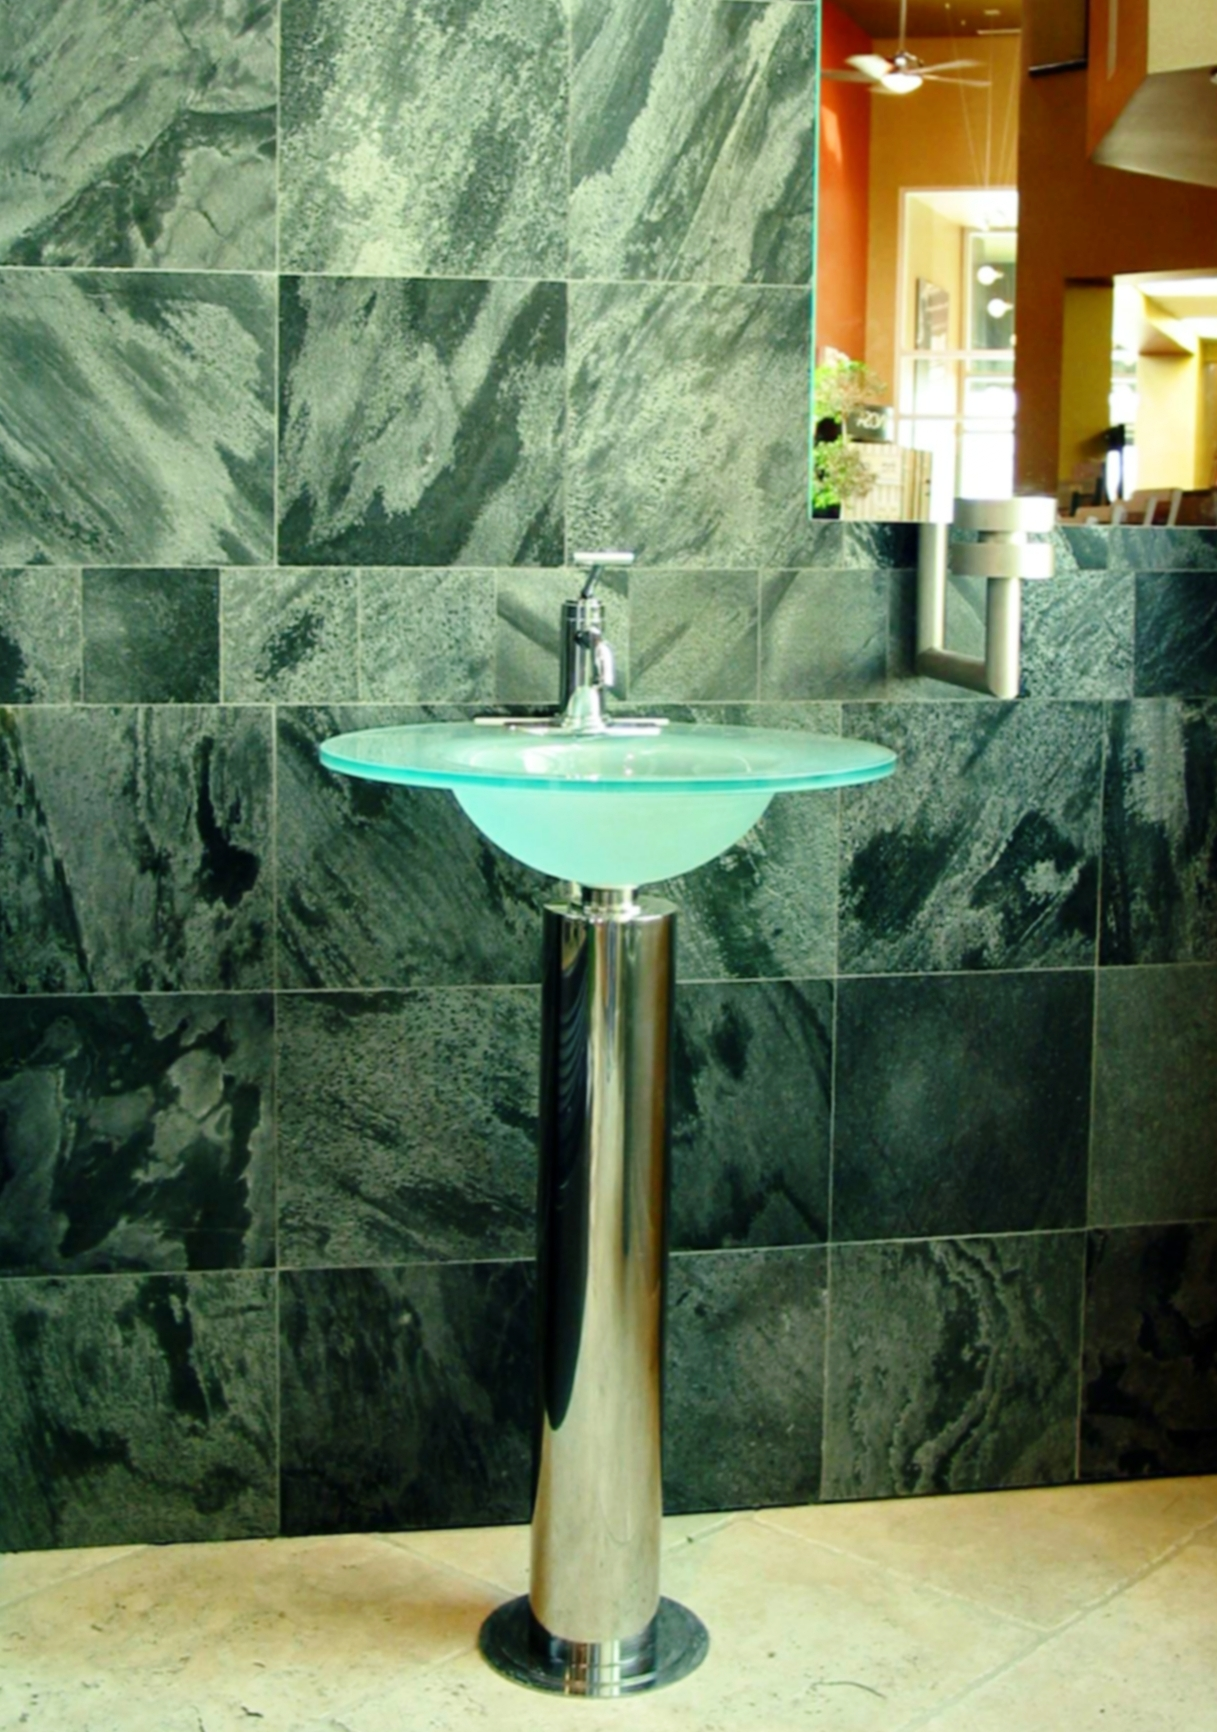 Slate wall glass bathroom sink ideas inspiration.JPG